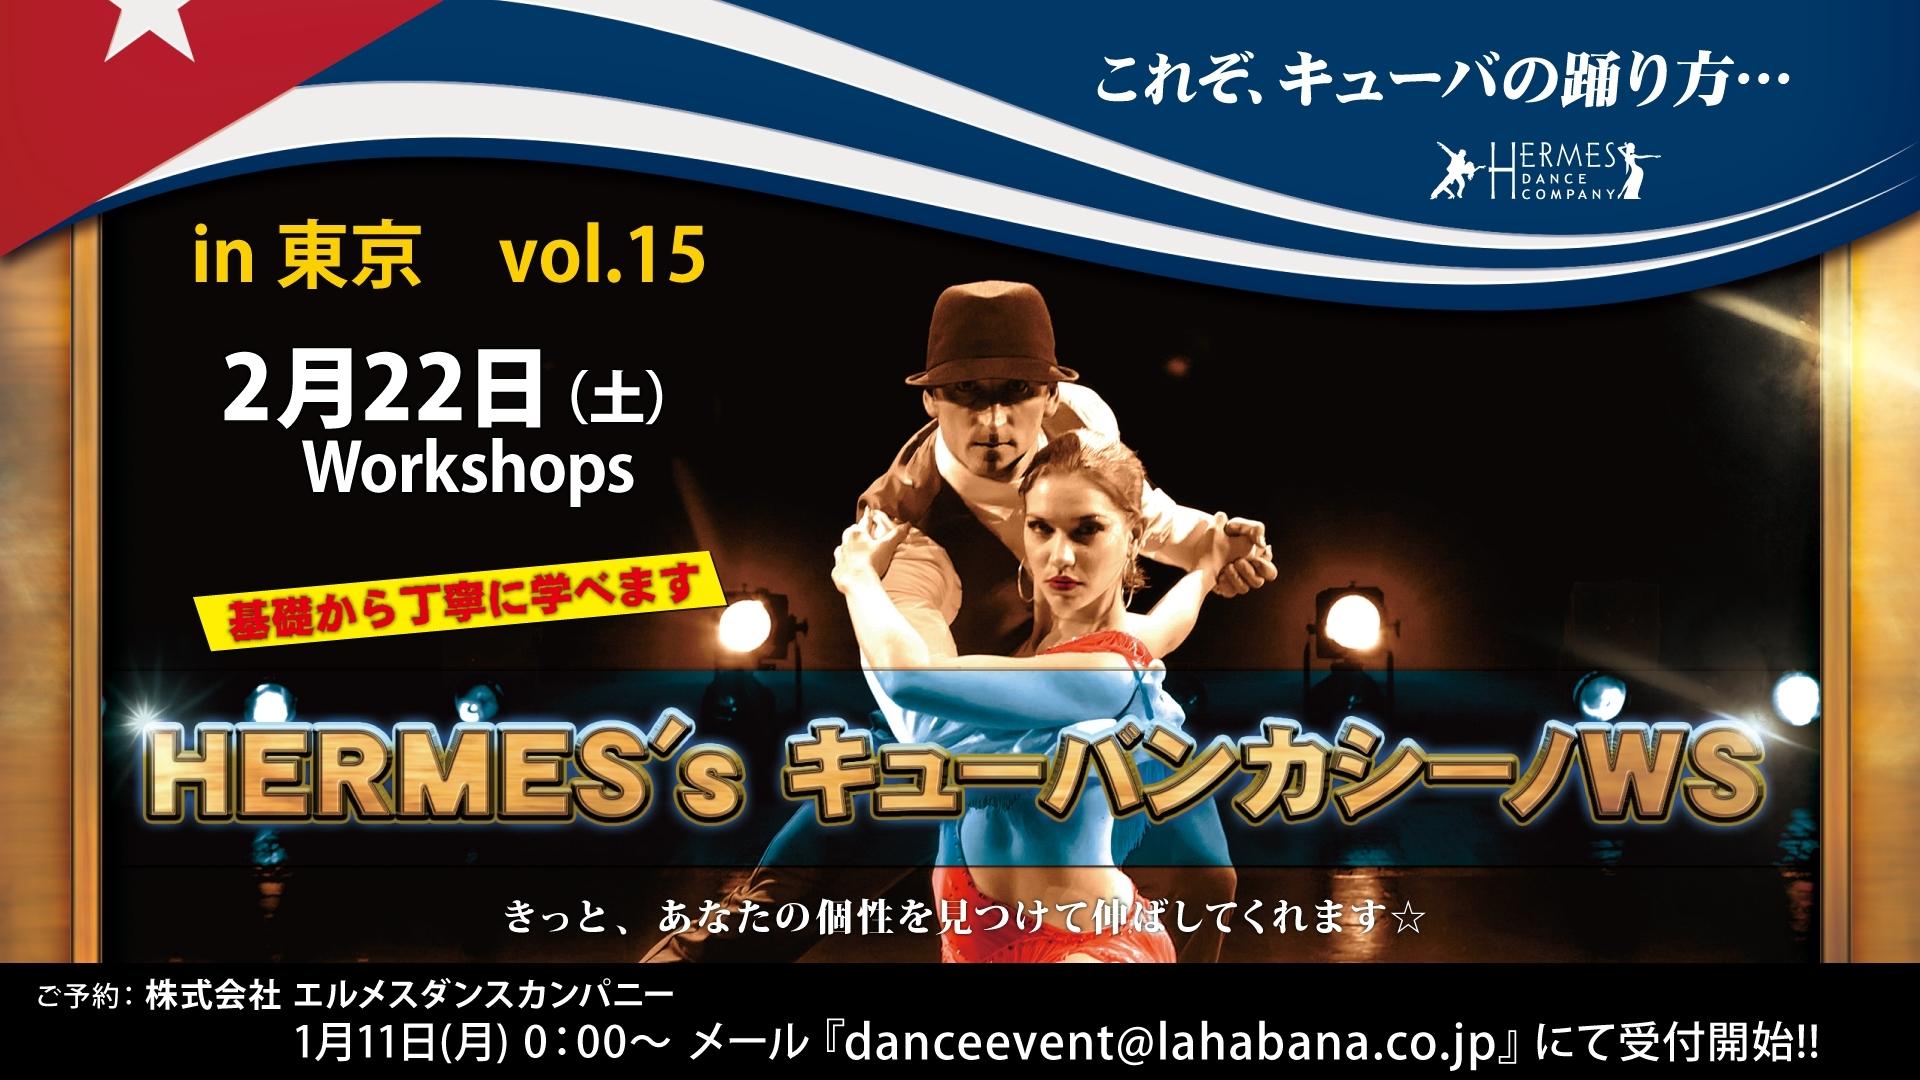 ★Hermes東京WS vol.15★